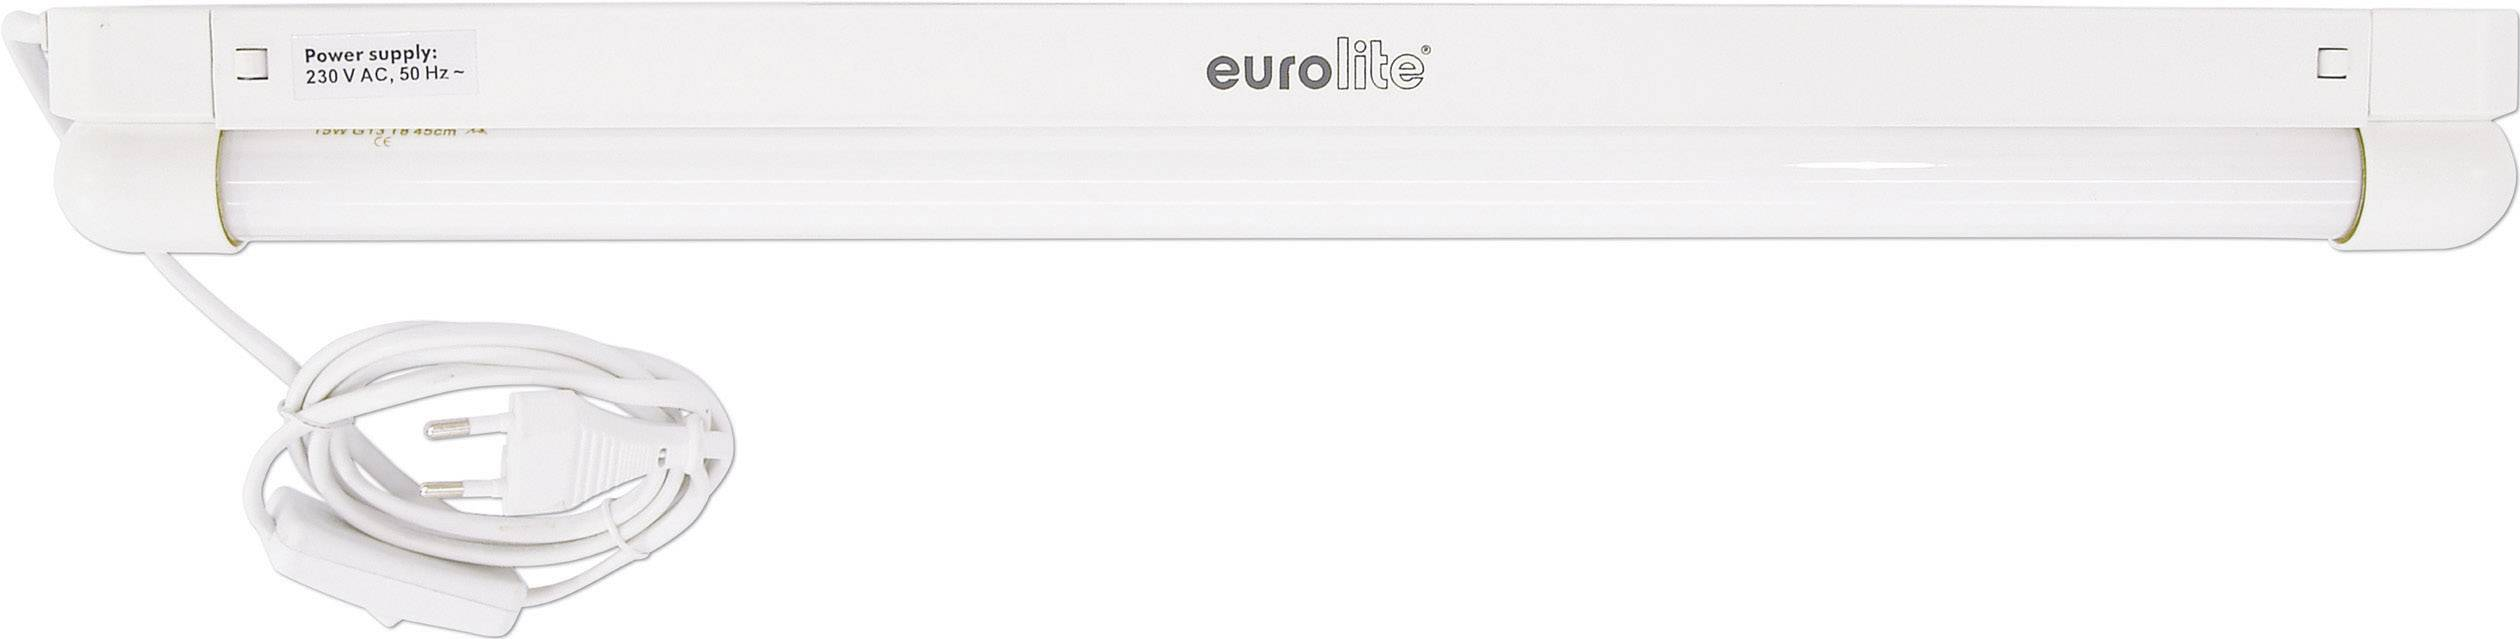 Žiarivka so zásuvkou Eurolite Neonröhren-Komplettset, 450 mm, 18 W, biela, 1 ks